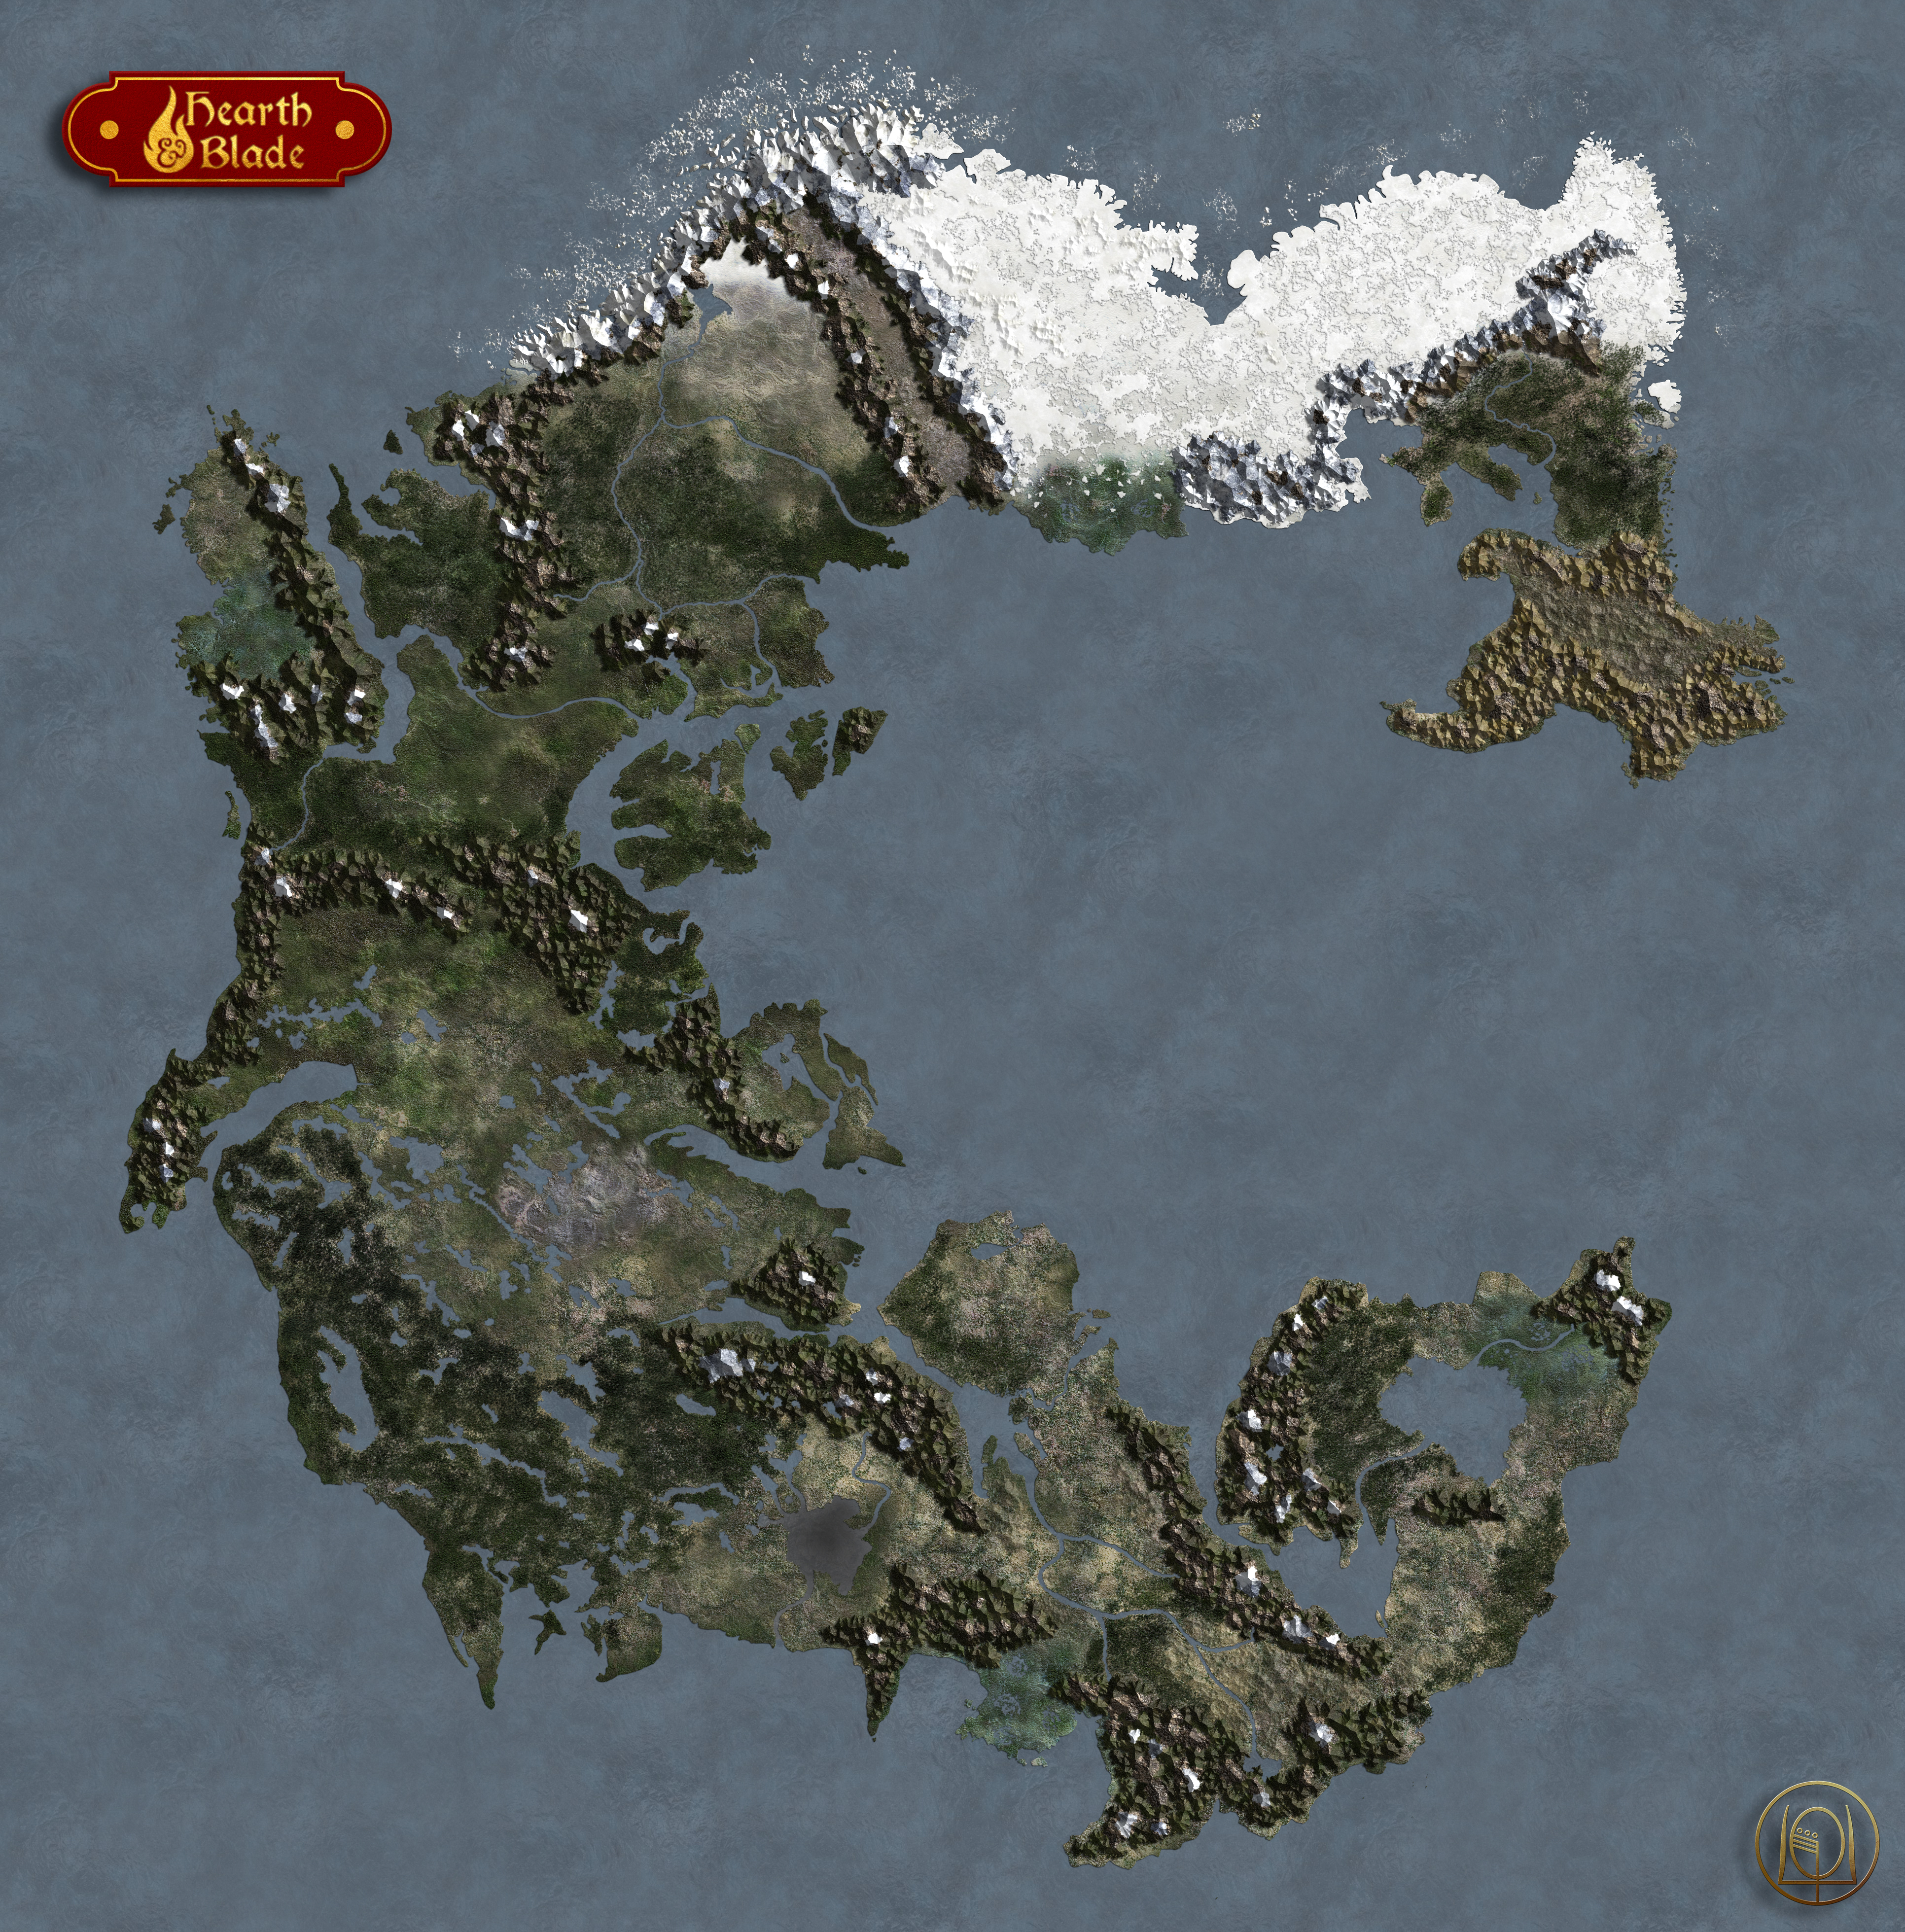 hearth_and_blade__yavmir_map_by_markonphoenix-dajvtgd